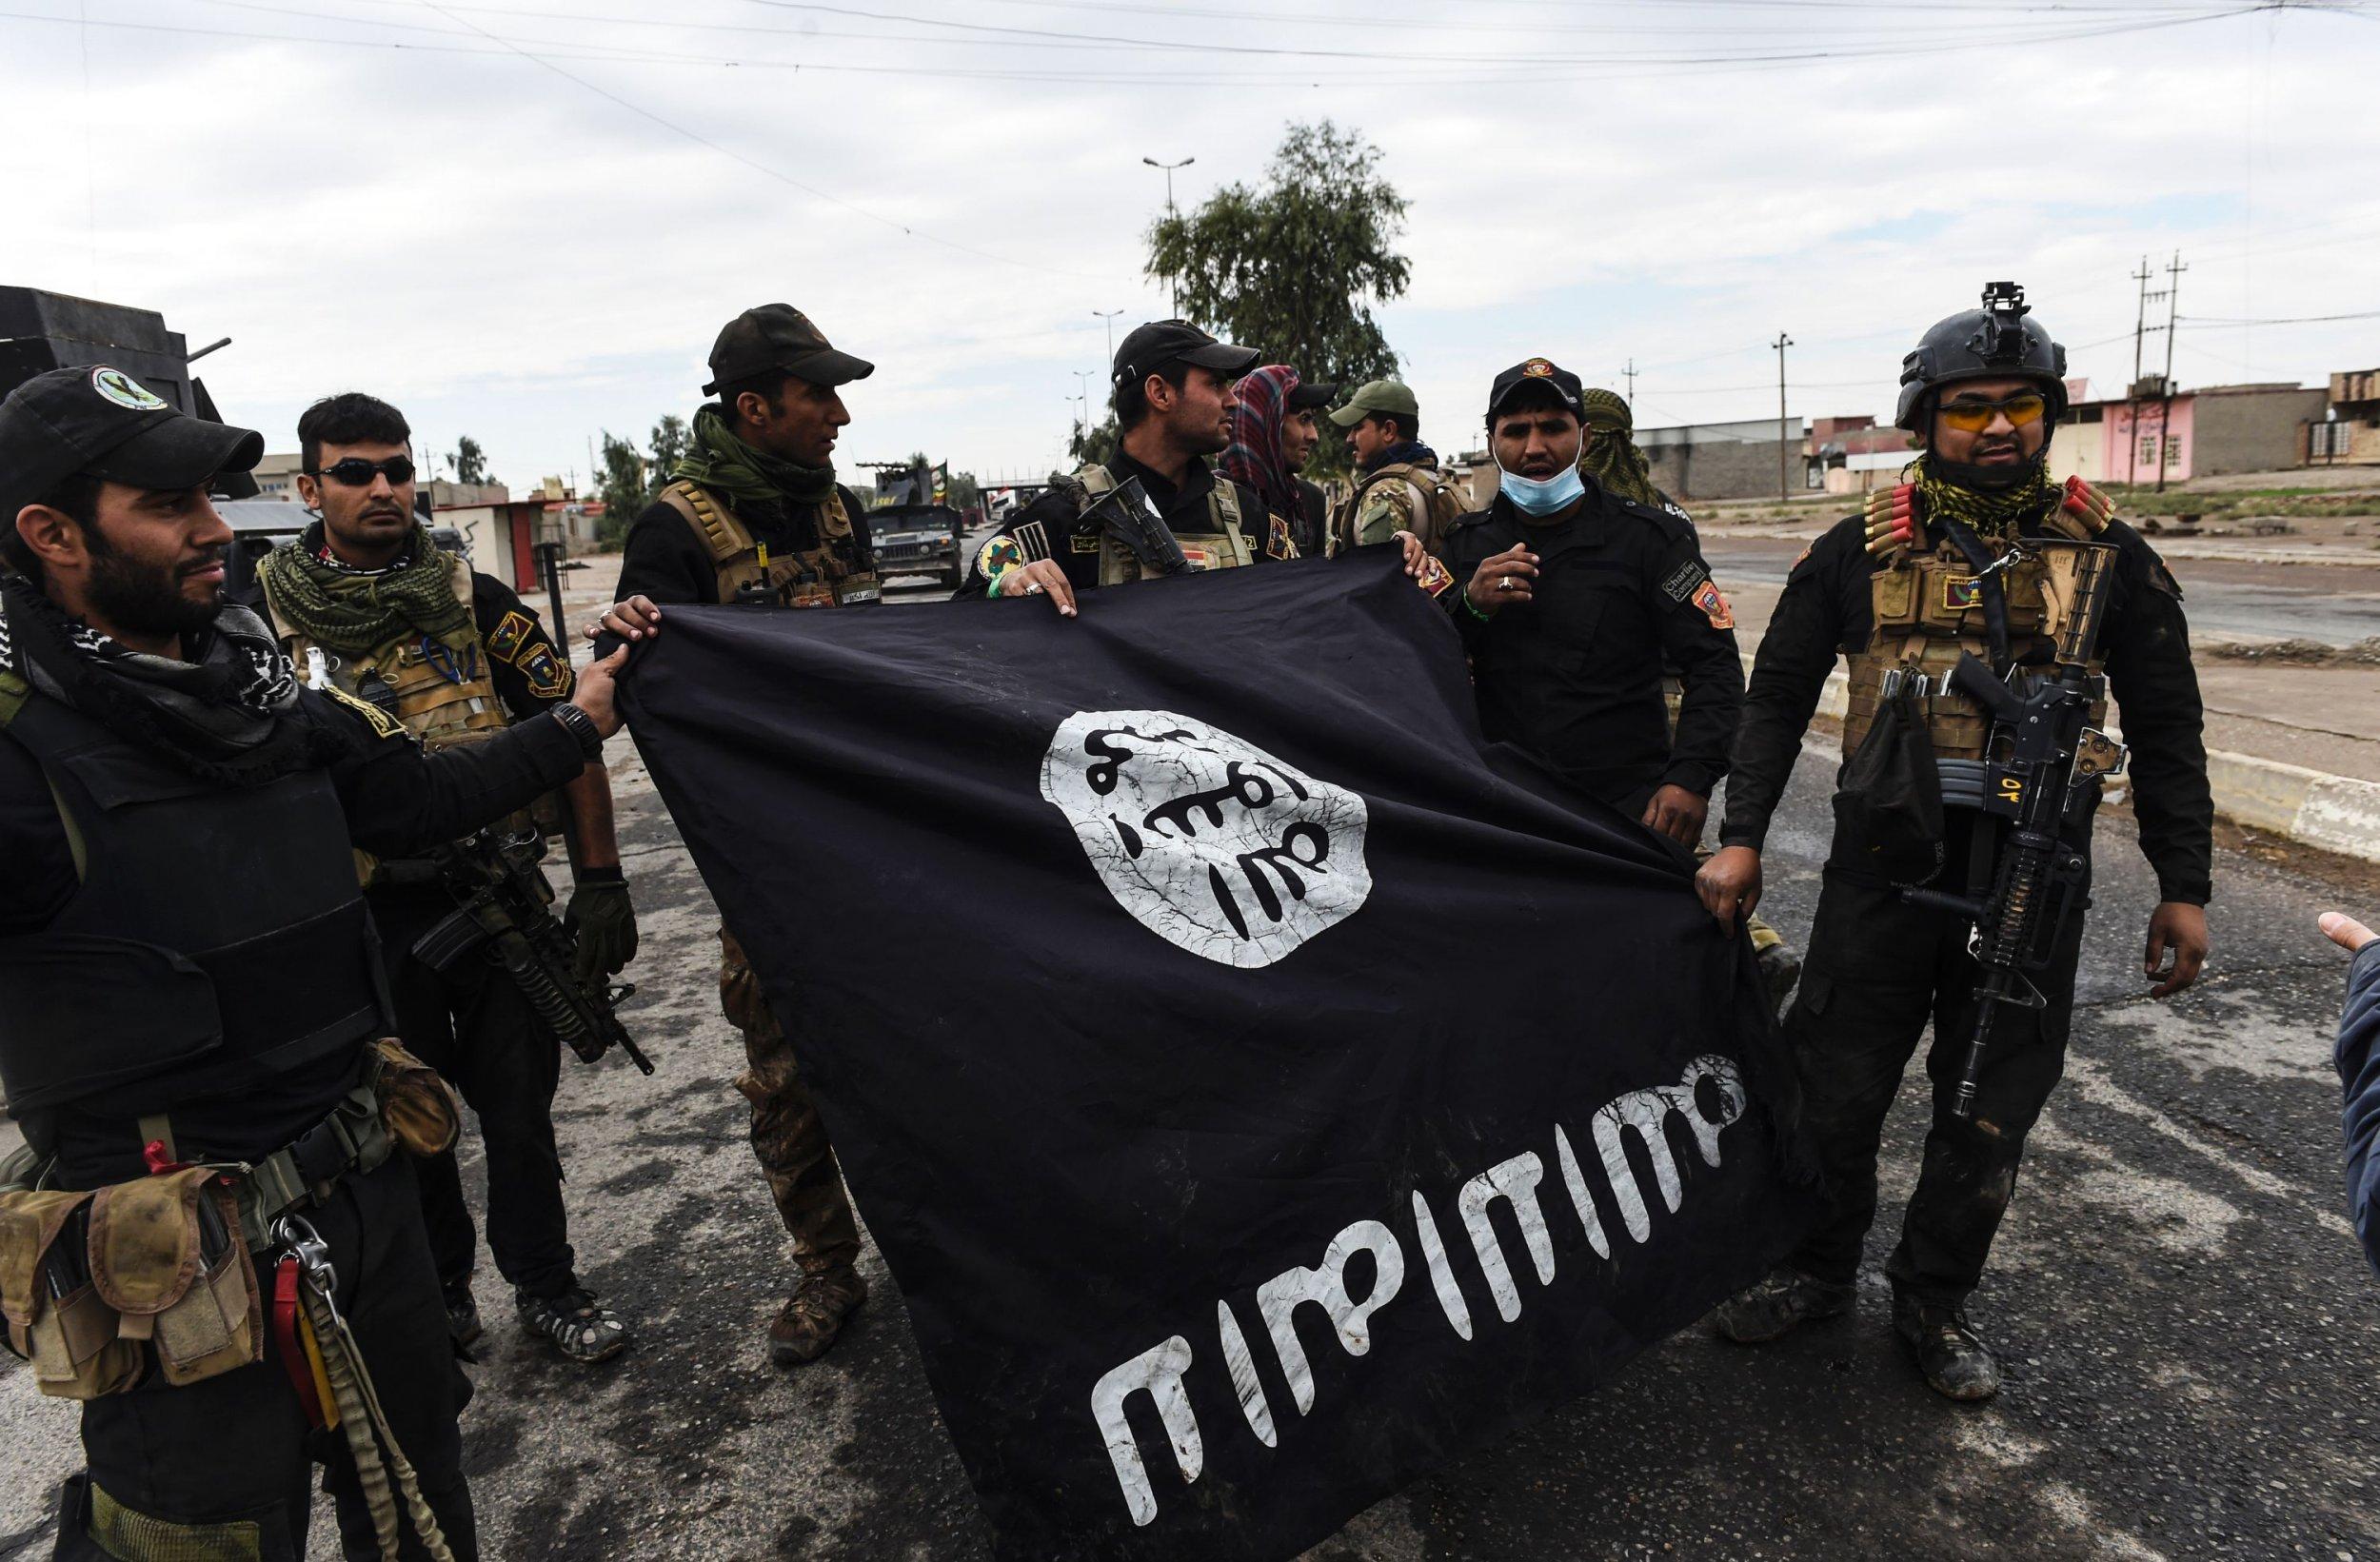 Mosul ISIS flag